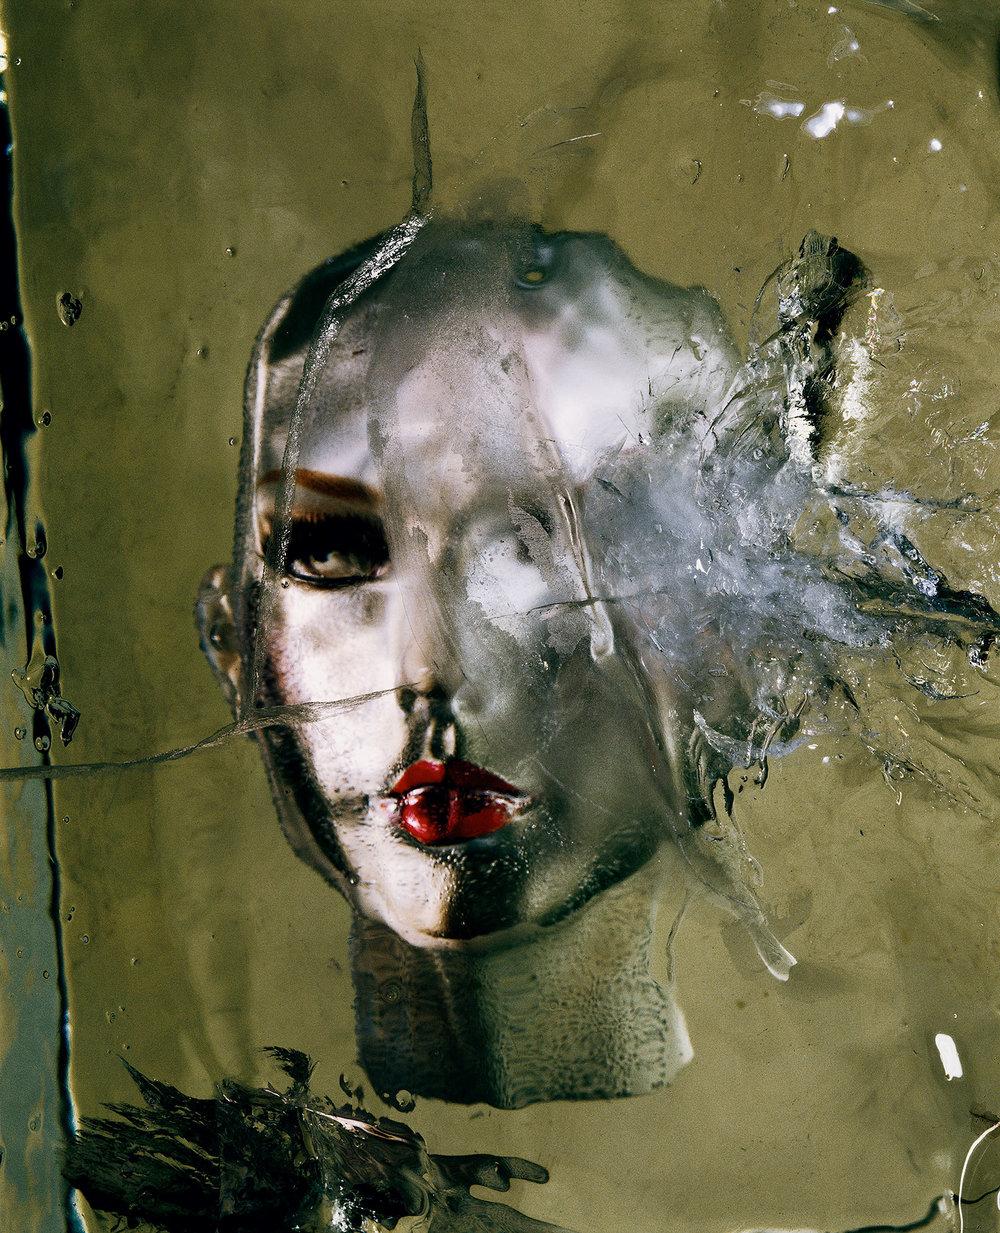 Irving Penn,  Head in Ice  ,  New York, 2002  ©  Condé Nast